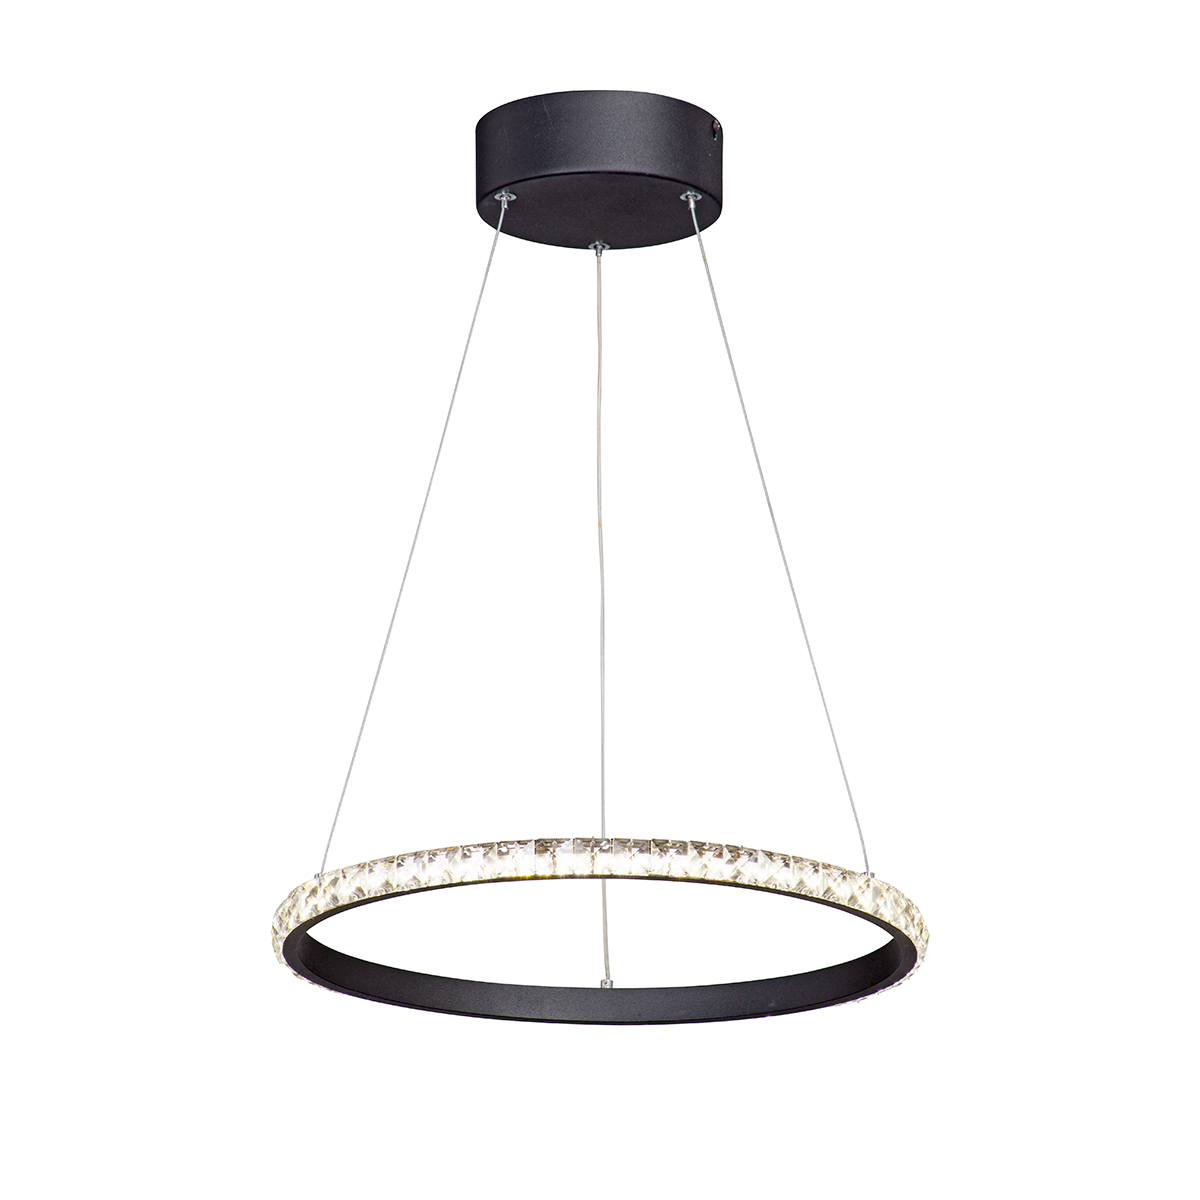 Фото - Светодиодный Vitaluce светильник V4629-1/1S, LED 25Вт, 3900-4200K подвесной светильник кск электро светодиодный светильник v4617 1 2s led 91вт 3900 4200k